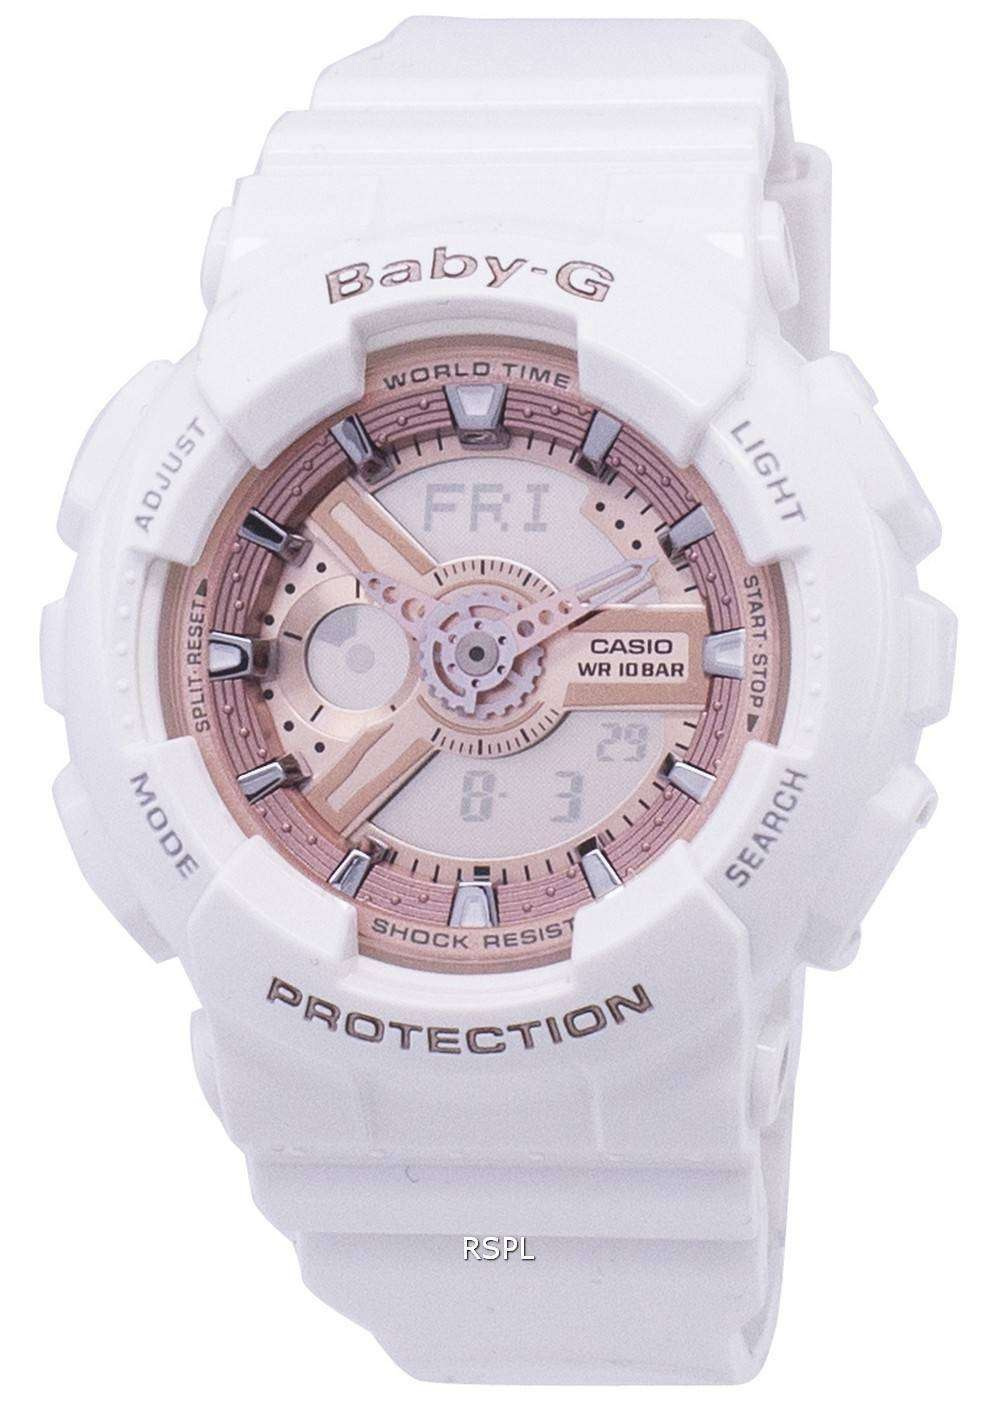 44009dca8fd63 Casio Baby-G World Time Analog-Digital BA-110-7A1 Womens Watch ...